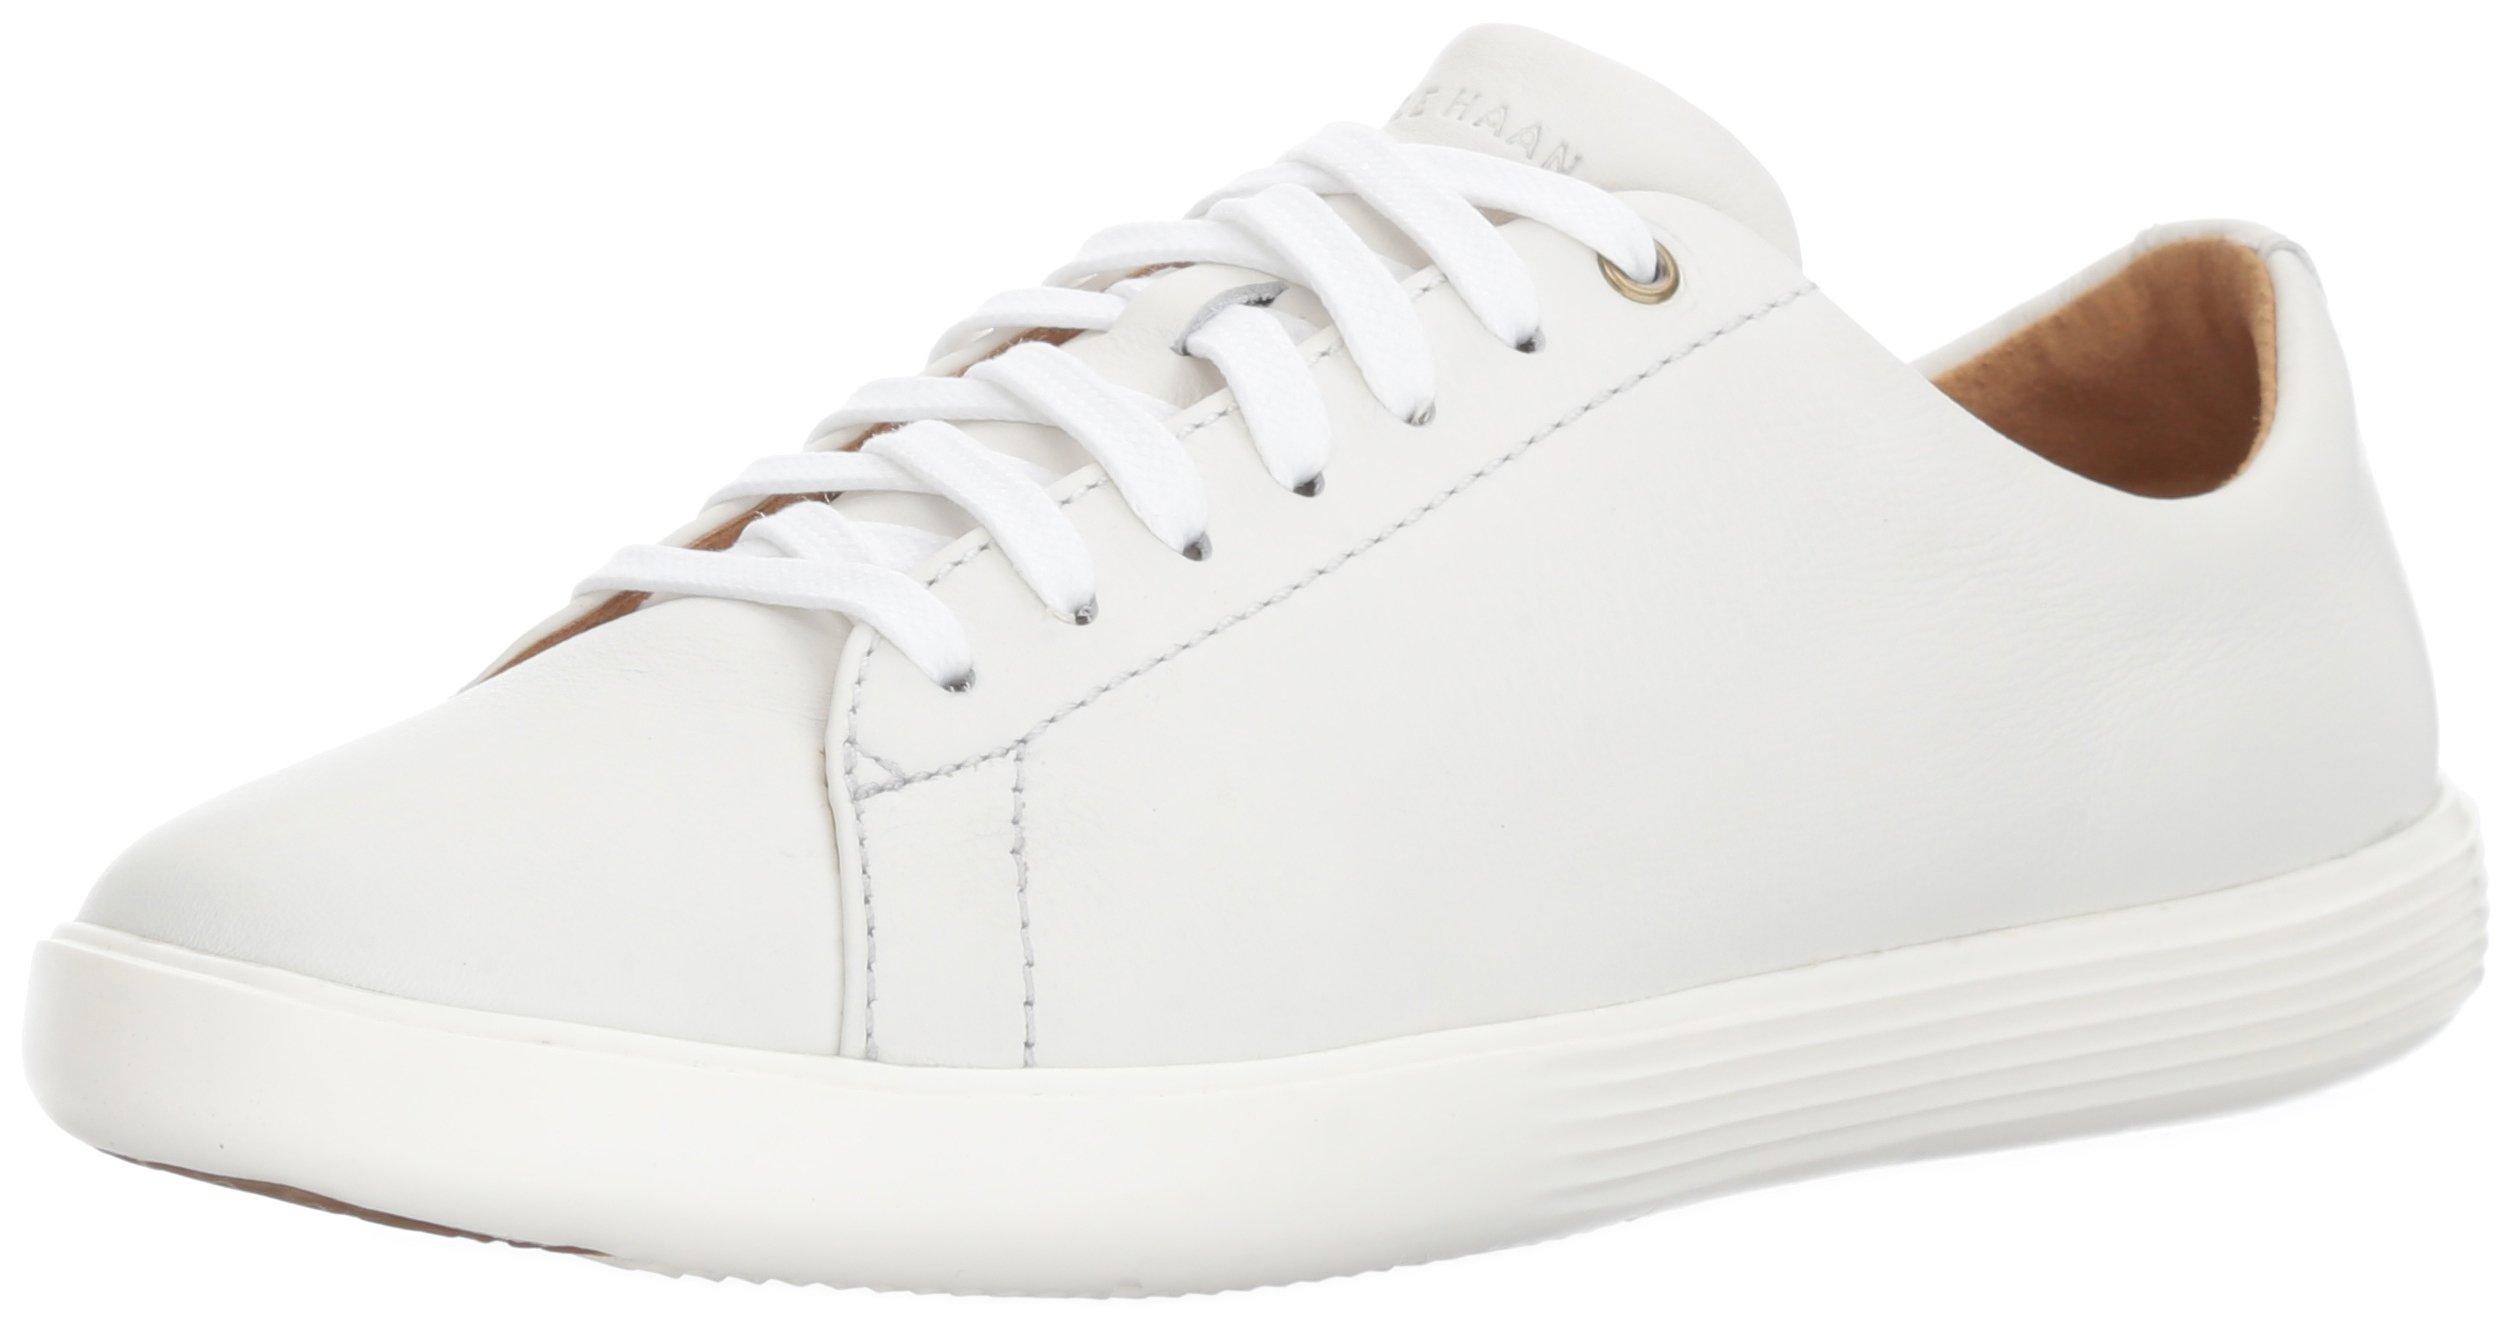 29184b1fce Galleon - Cole Haan Women's Grand Crosscourt II Sneaker, Bright  Leather/Optic White, 8 B US